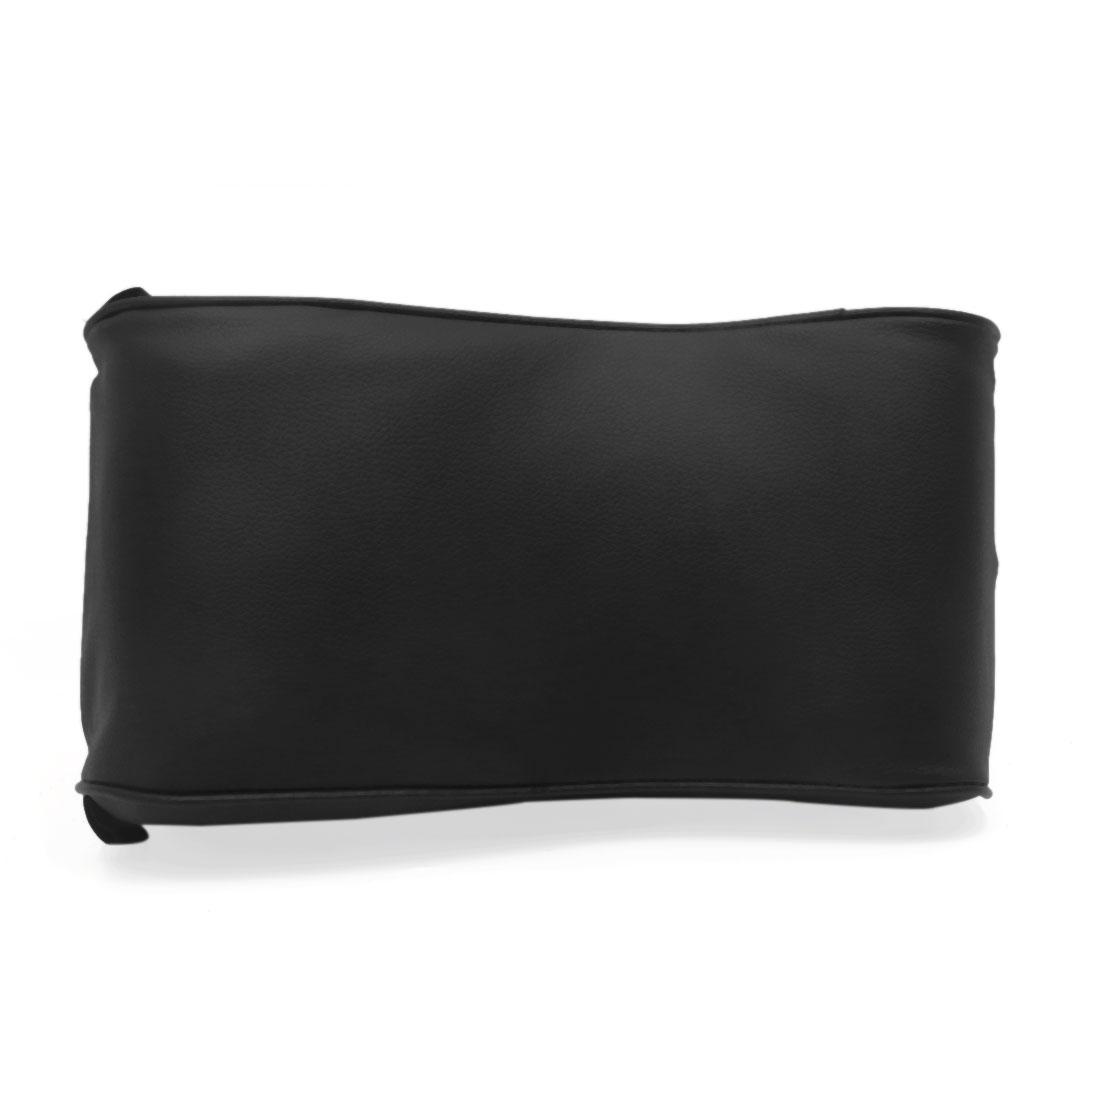 Black Faux Leather Memory Foam Car Auto Center Console Armrest Cushion Pad - image 3 of 4